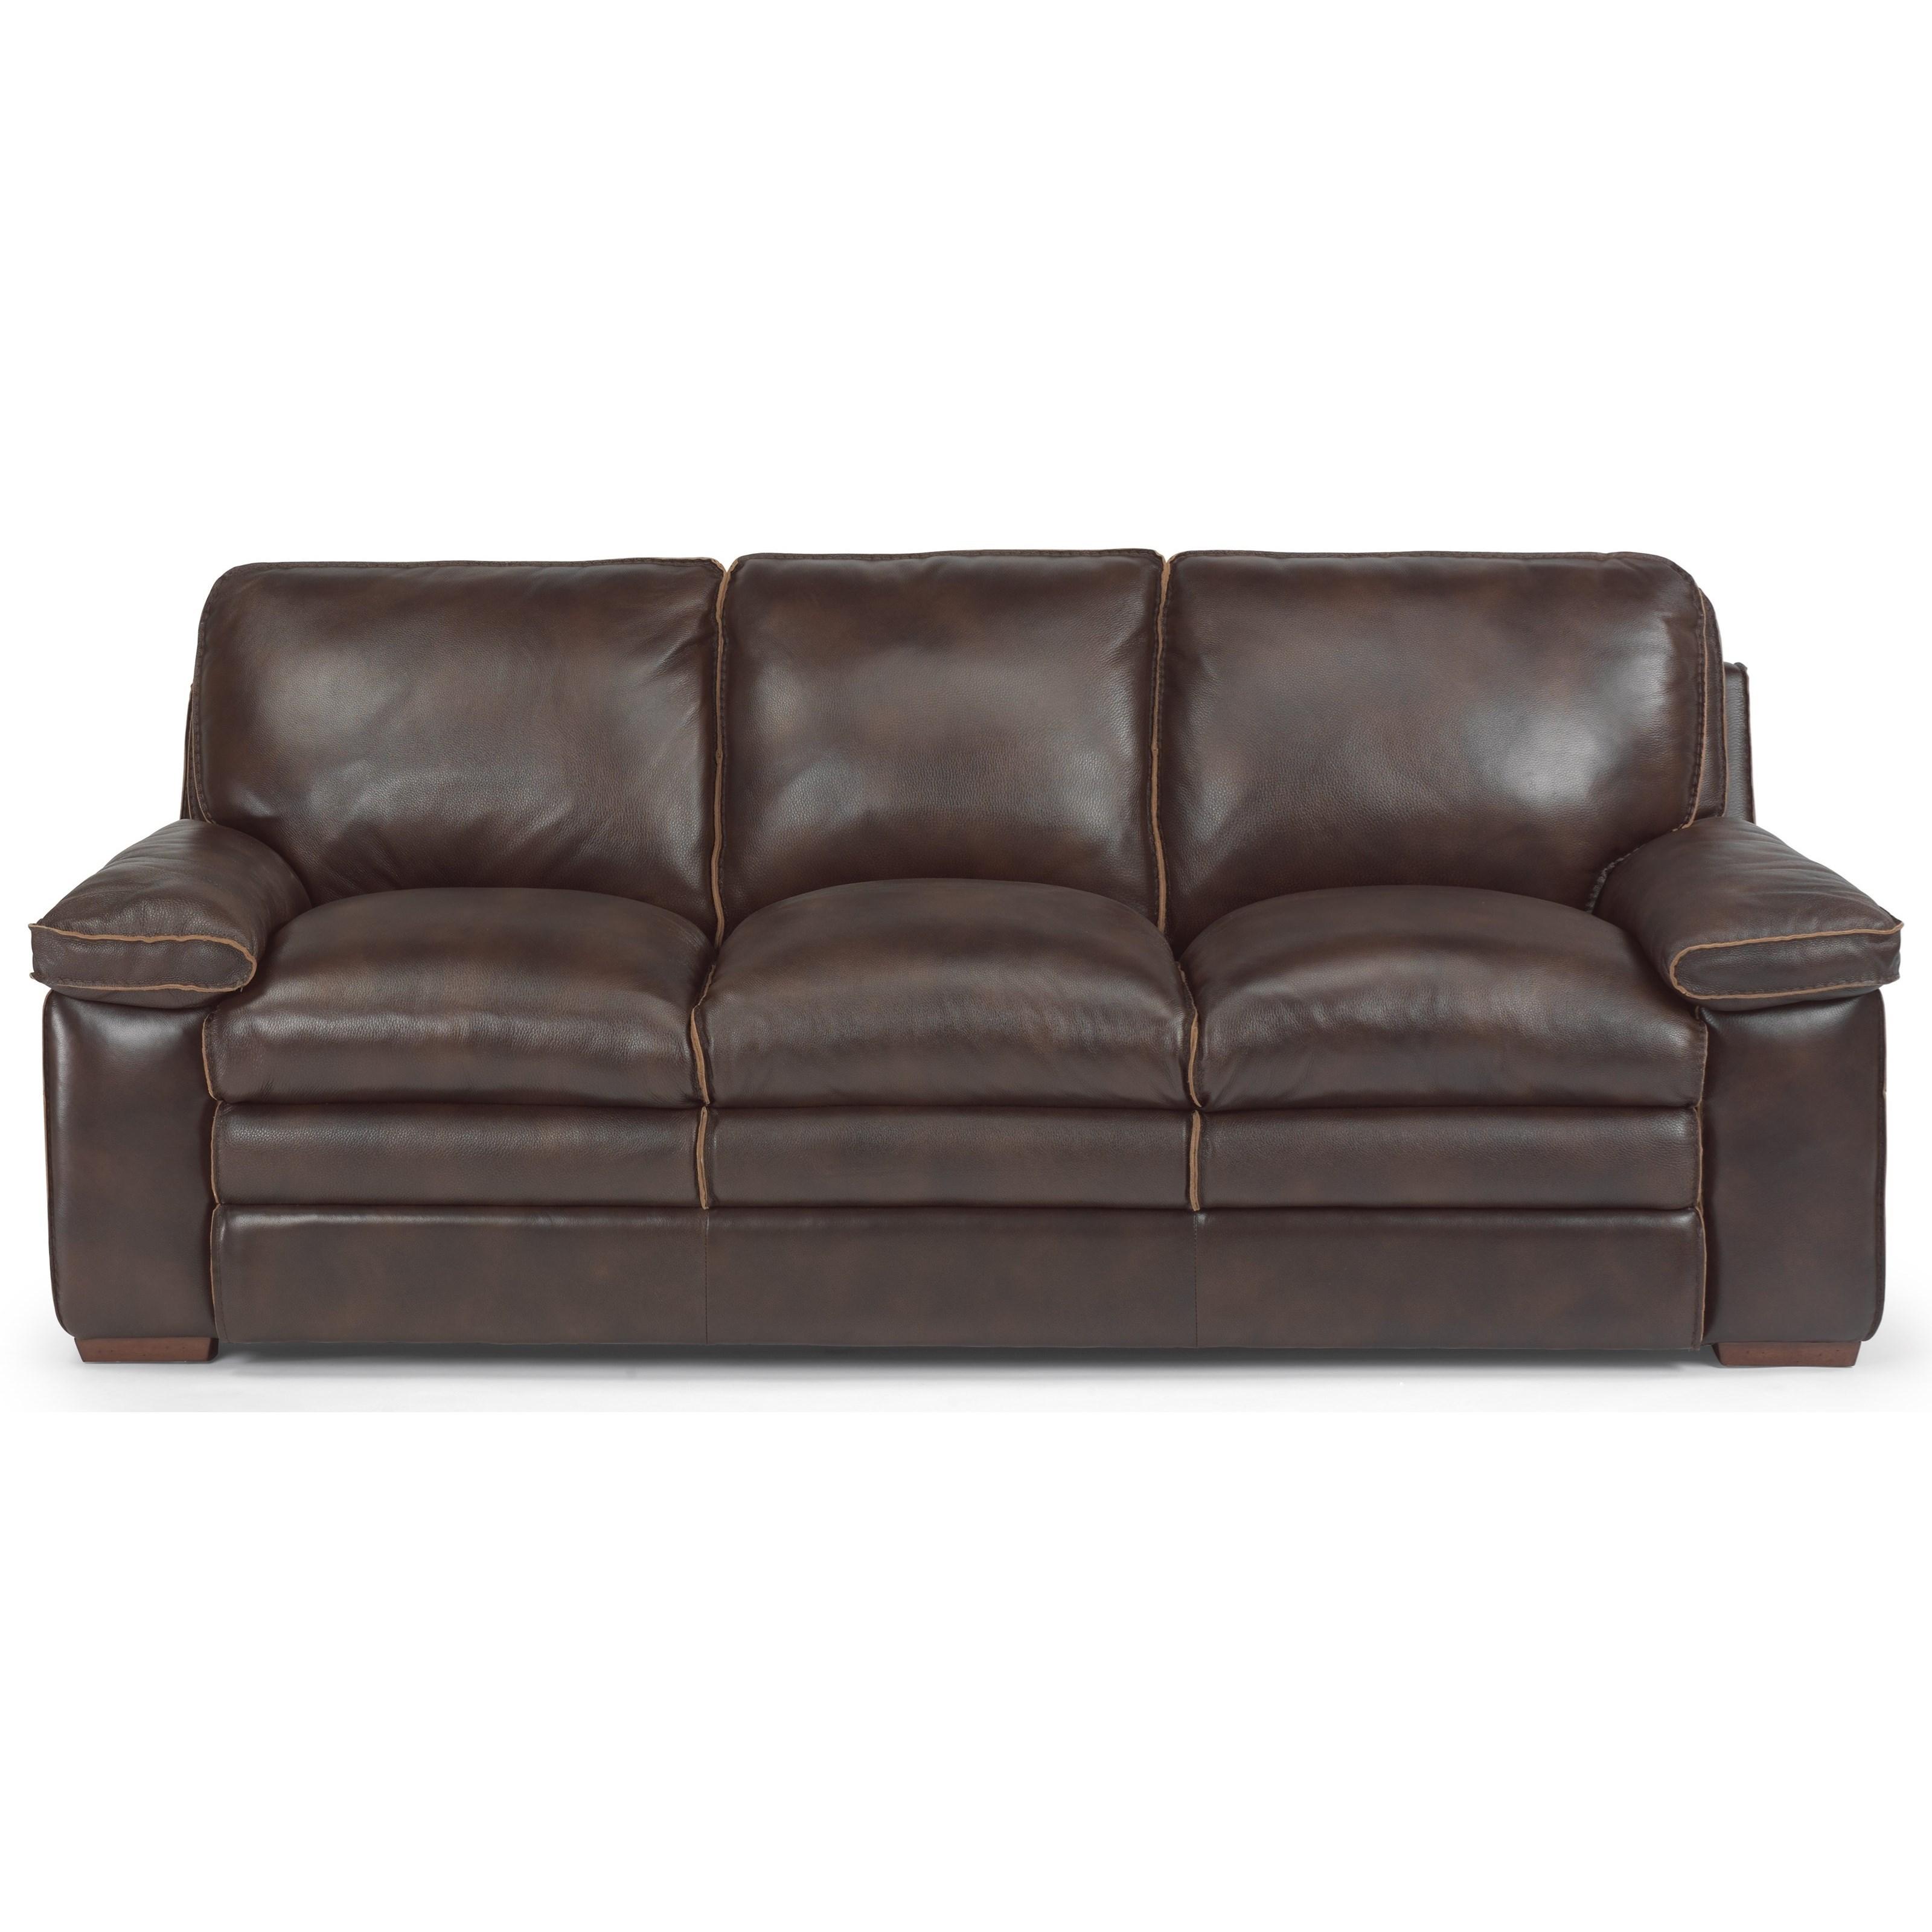 Awe Inspiring Latitudes Penthouse Sofa Evergreenethics Interior Chair Design Evergreenethicsorg